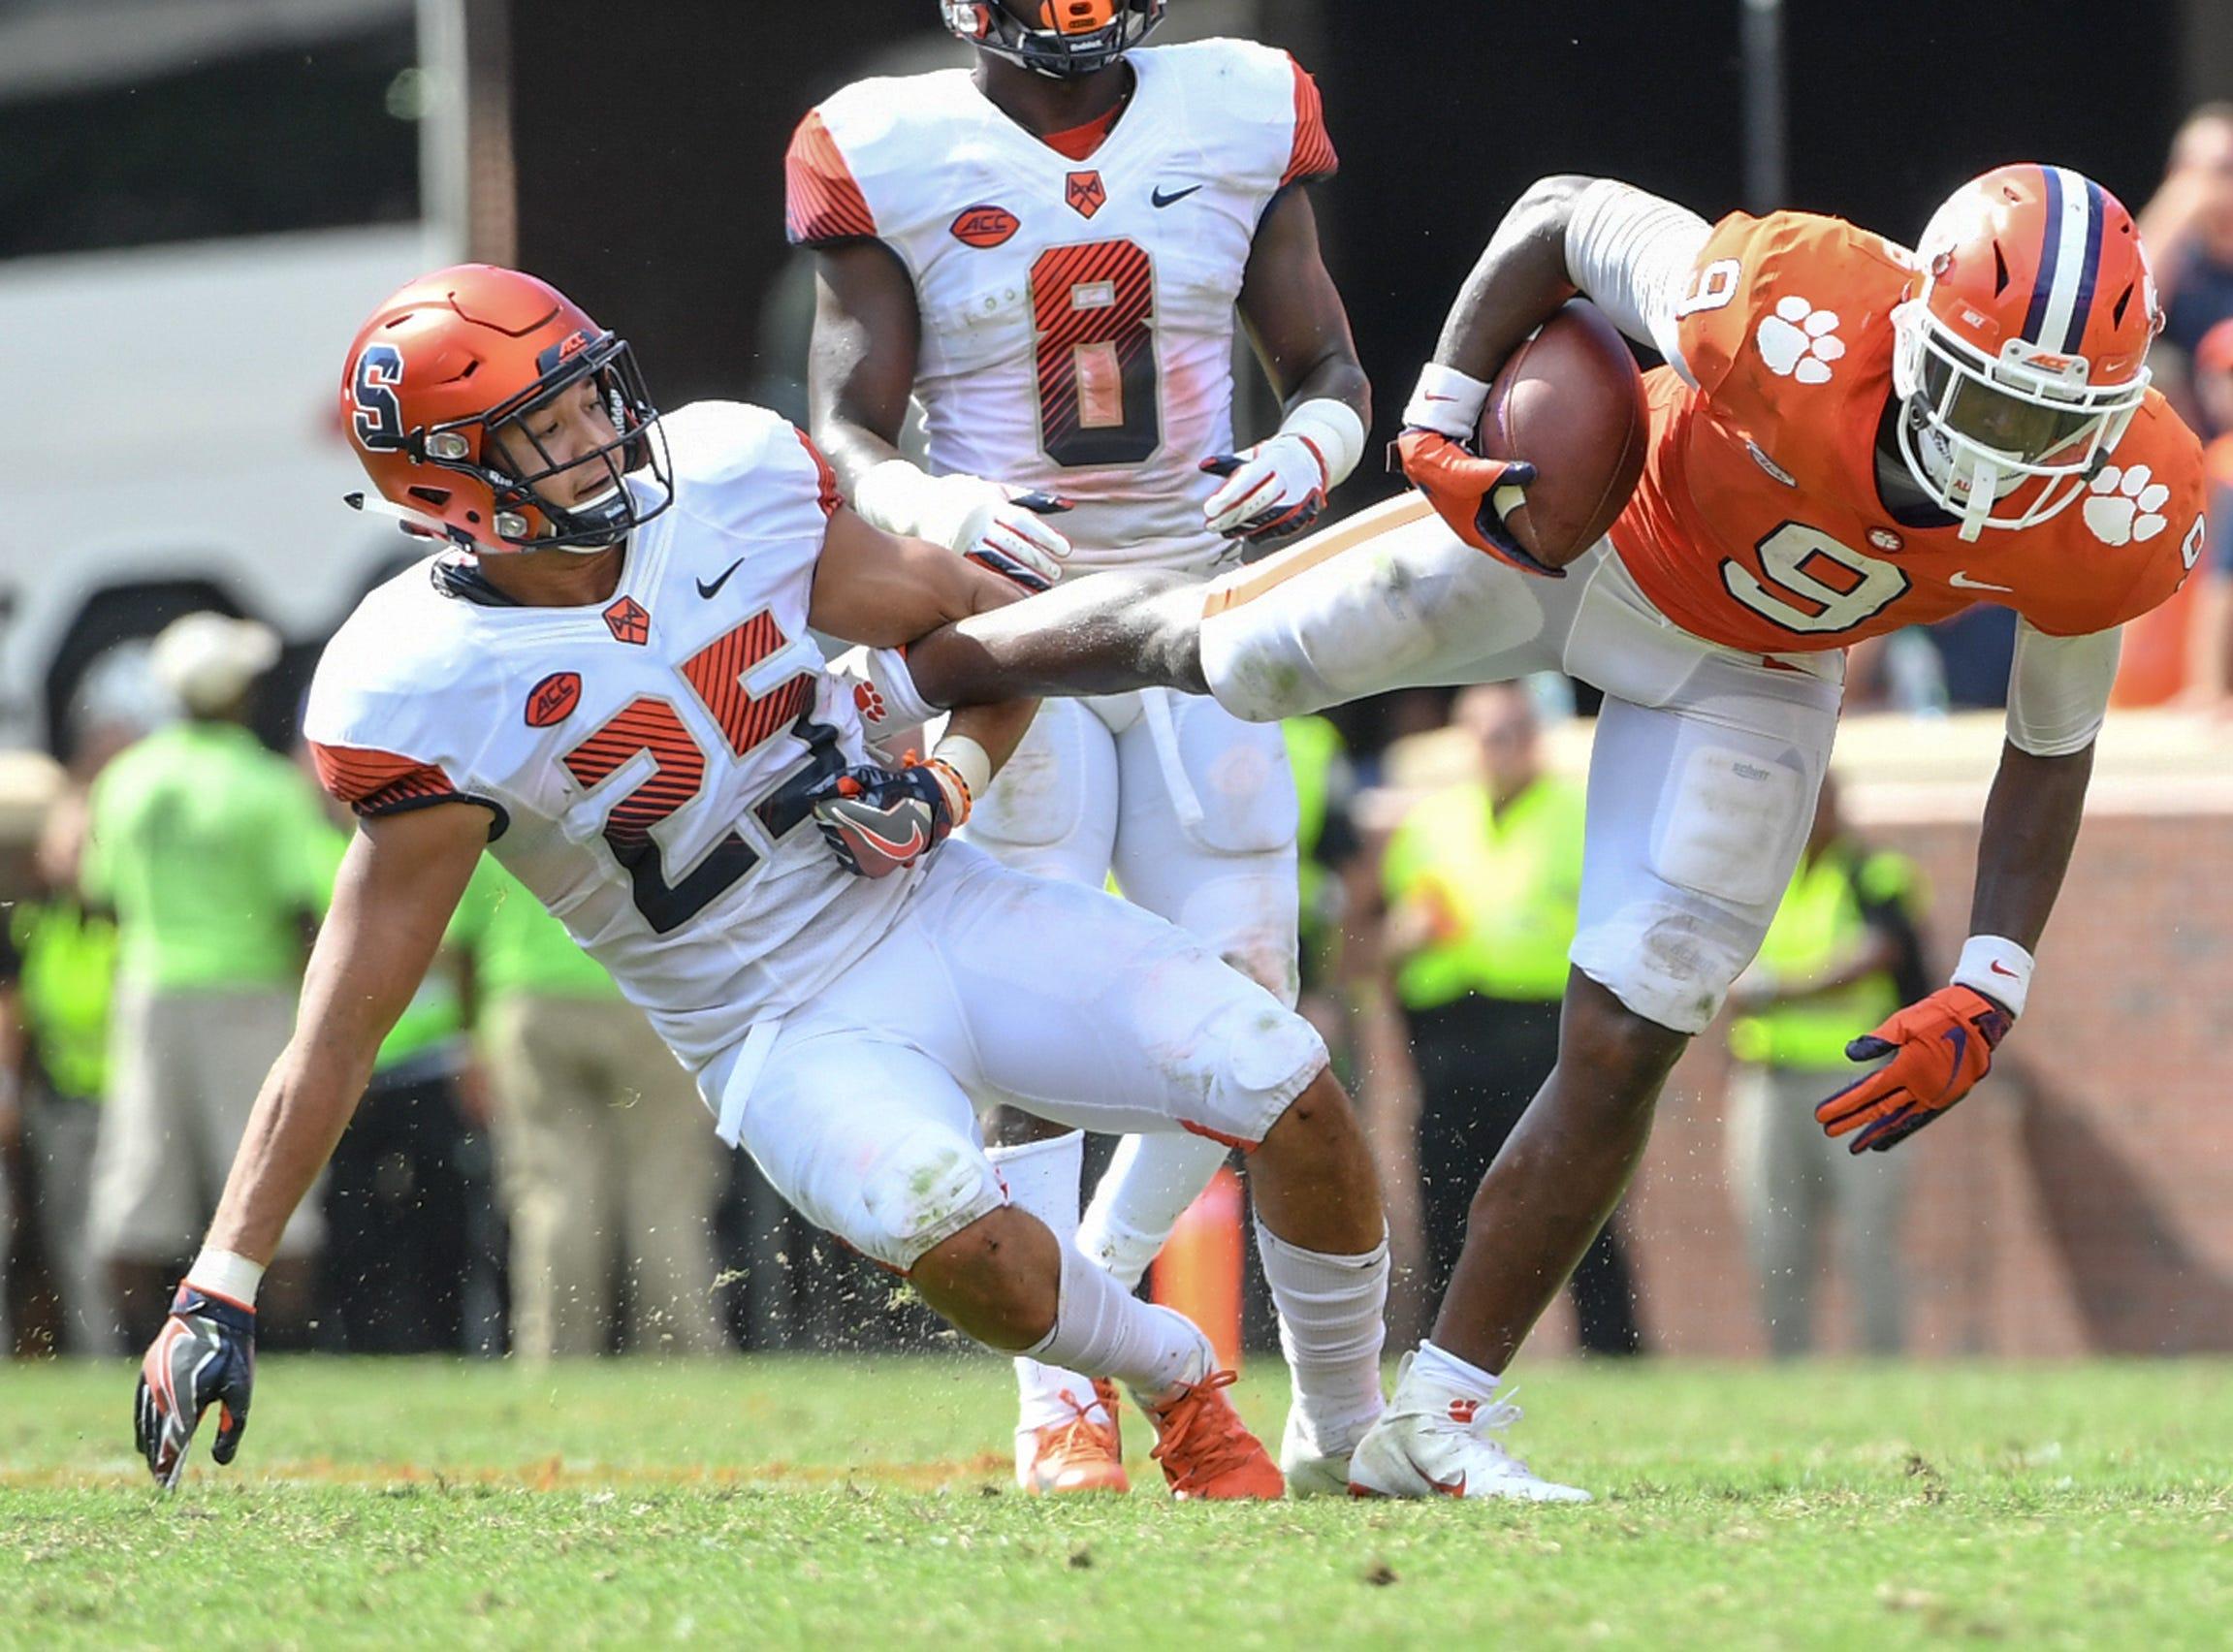 Syracuse linebacker Kielan Whitner(25) holds the foot of Clemson running back Travis Etienne (9) during the fourth quarter in Memorial Stadium on Saturday, September 29, 2018.